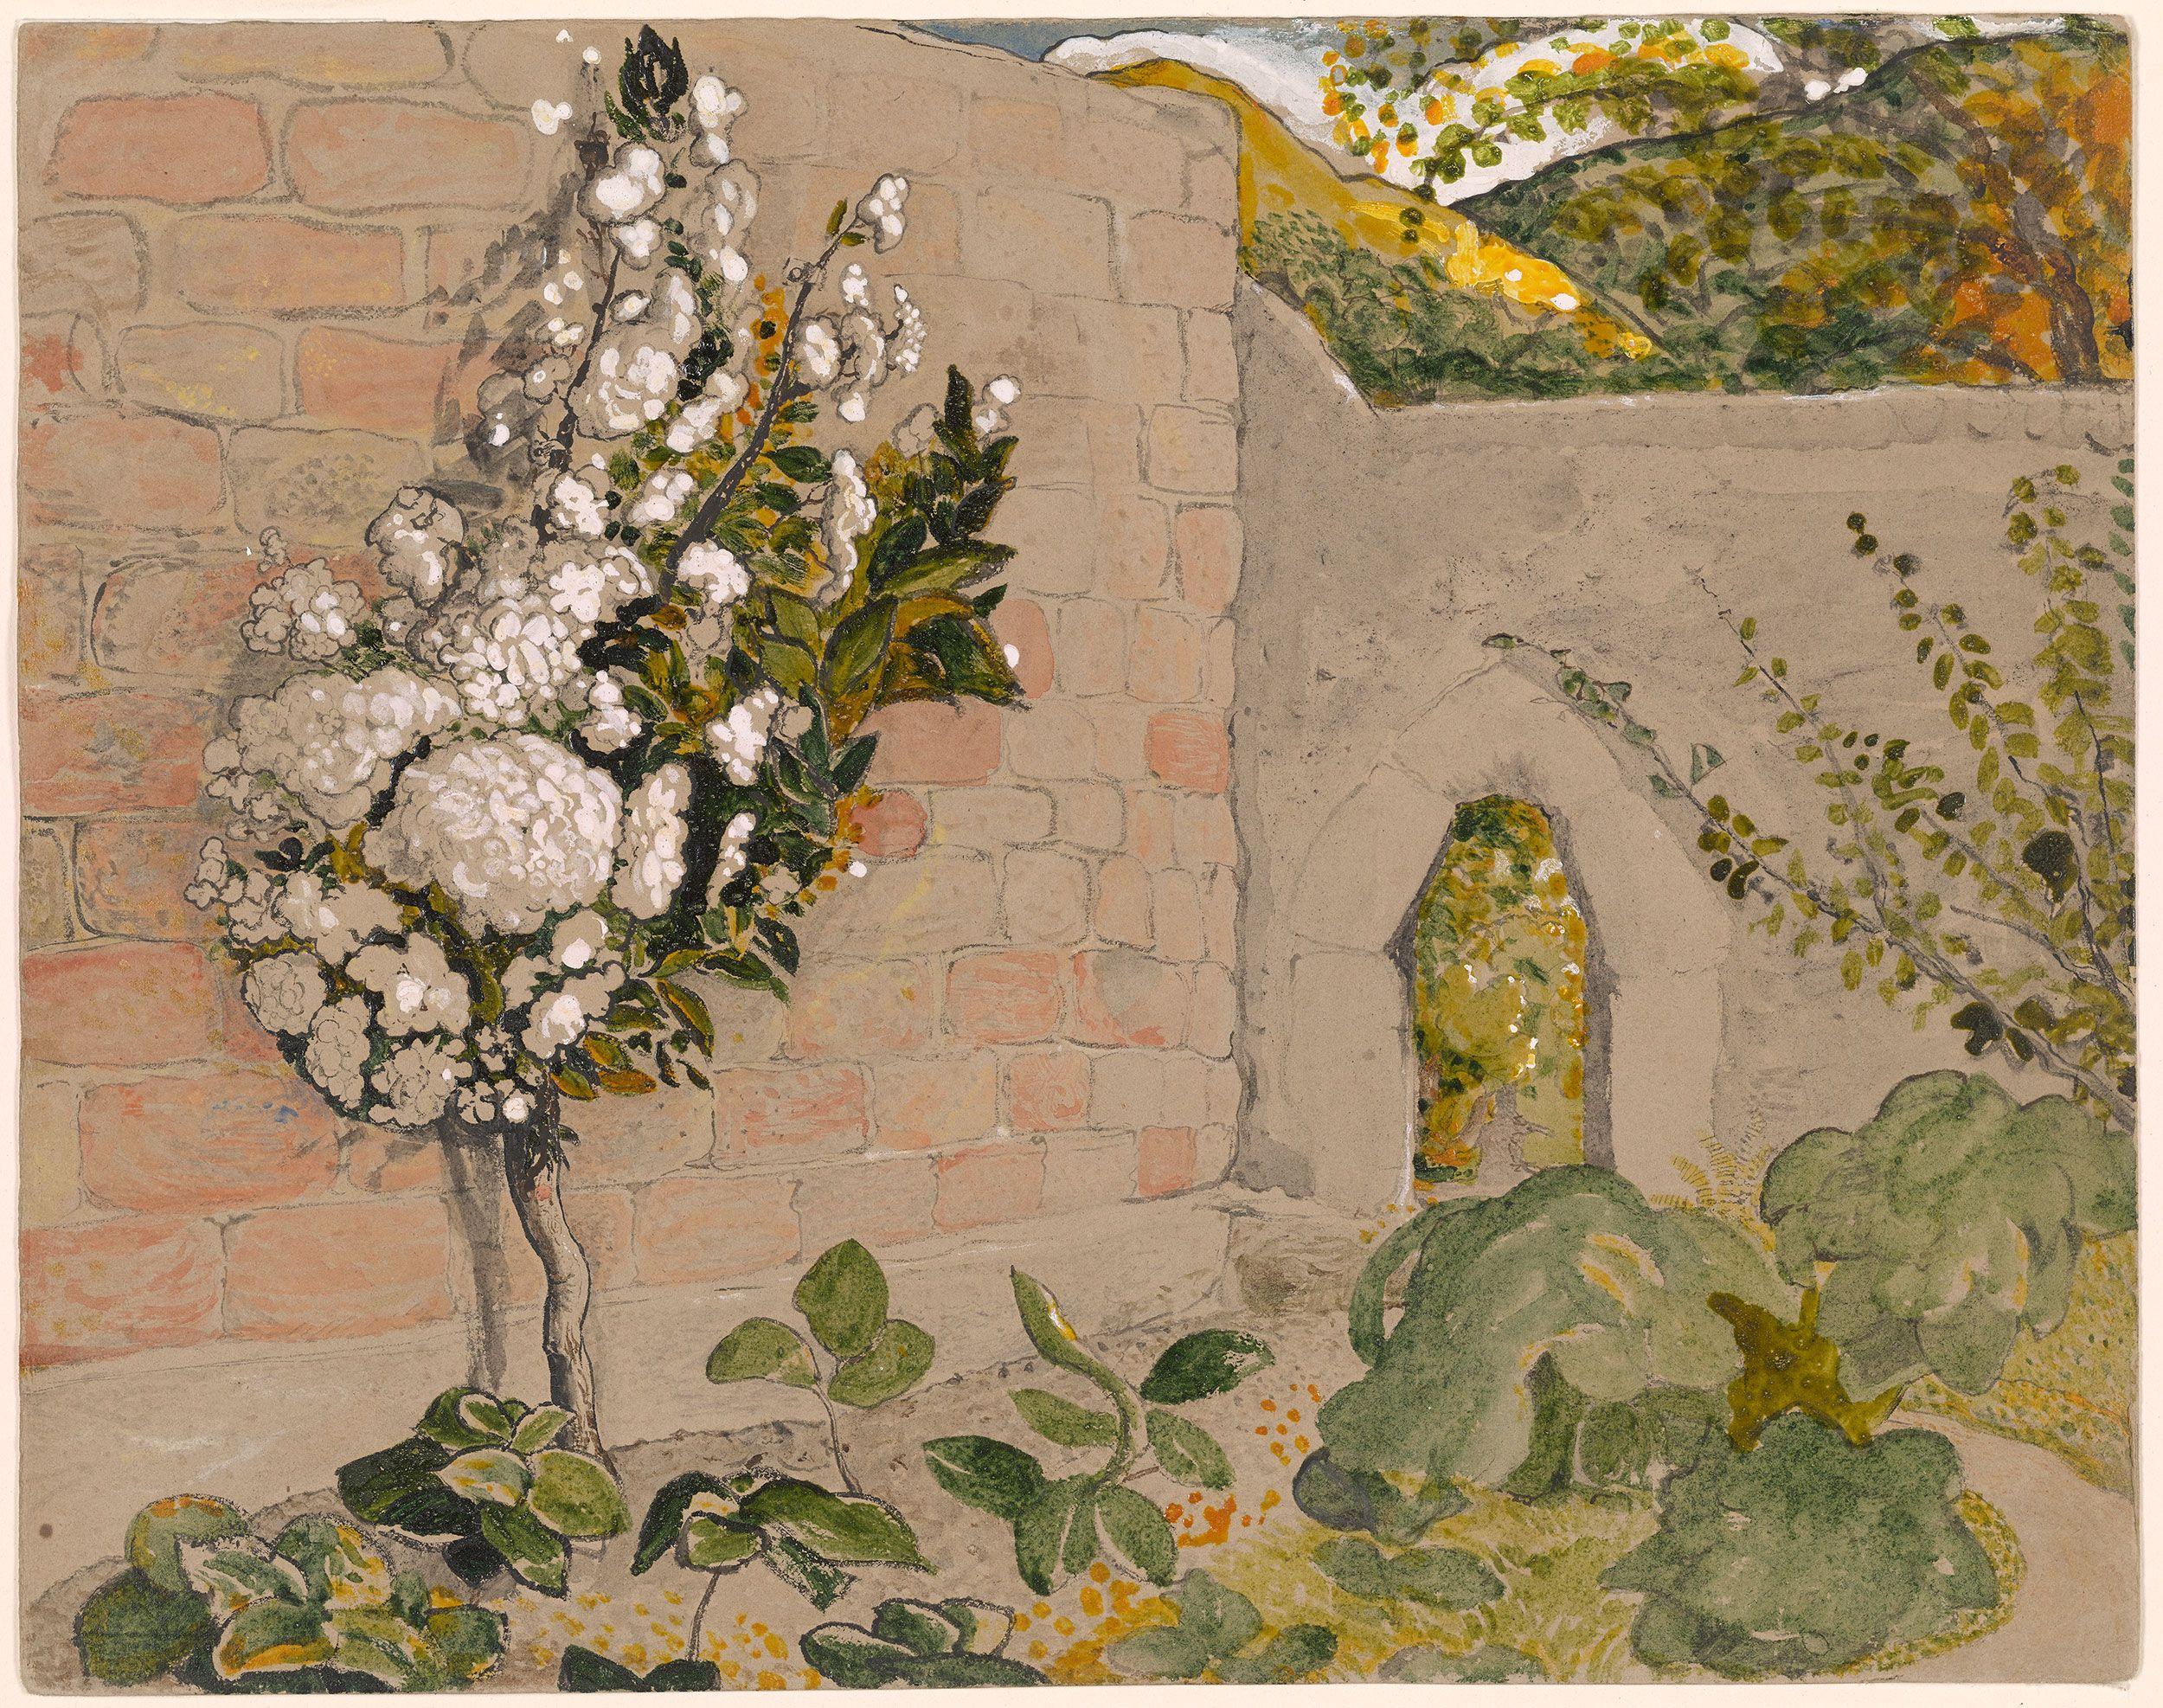 Samuel Palmer Pear Tree in a Walled Garden | Contemporary Art ...